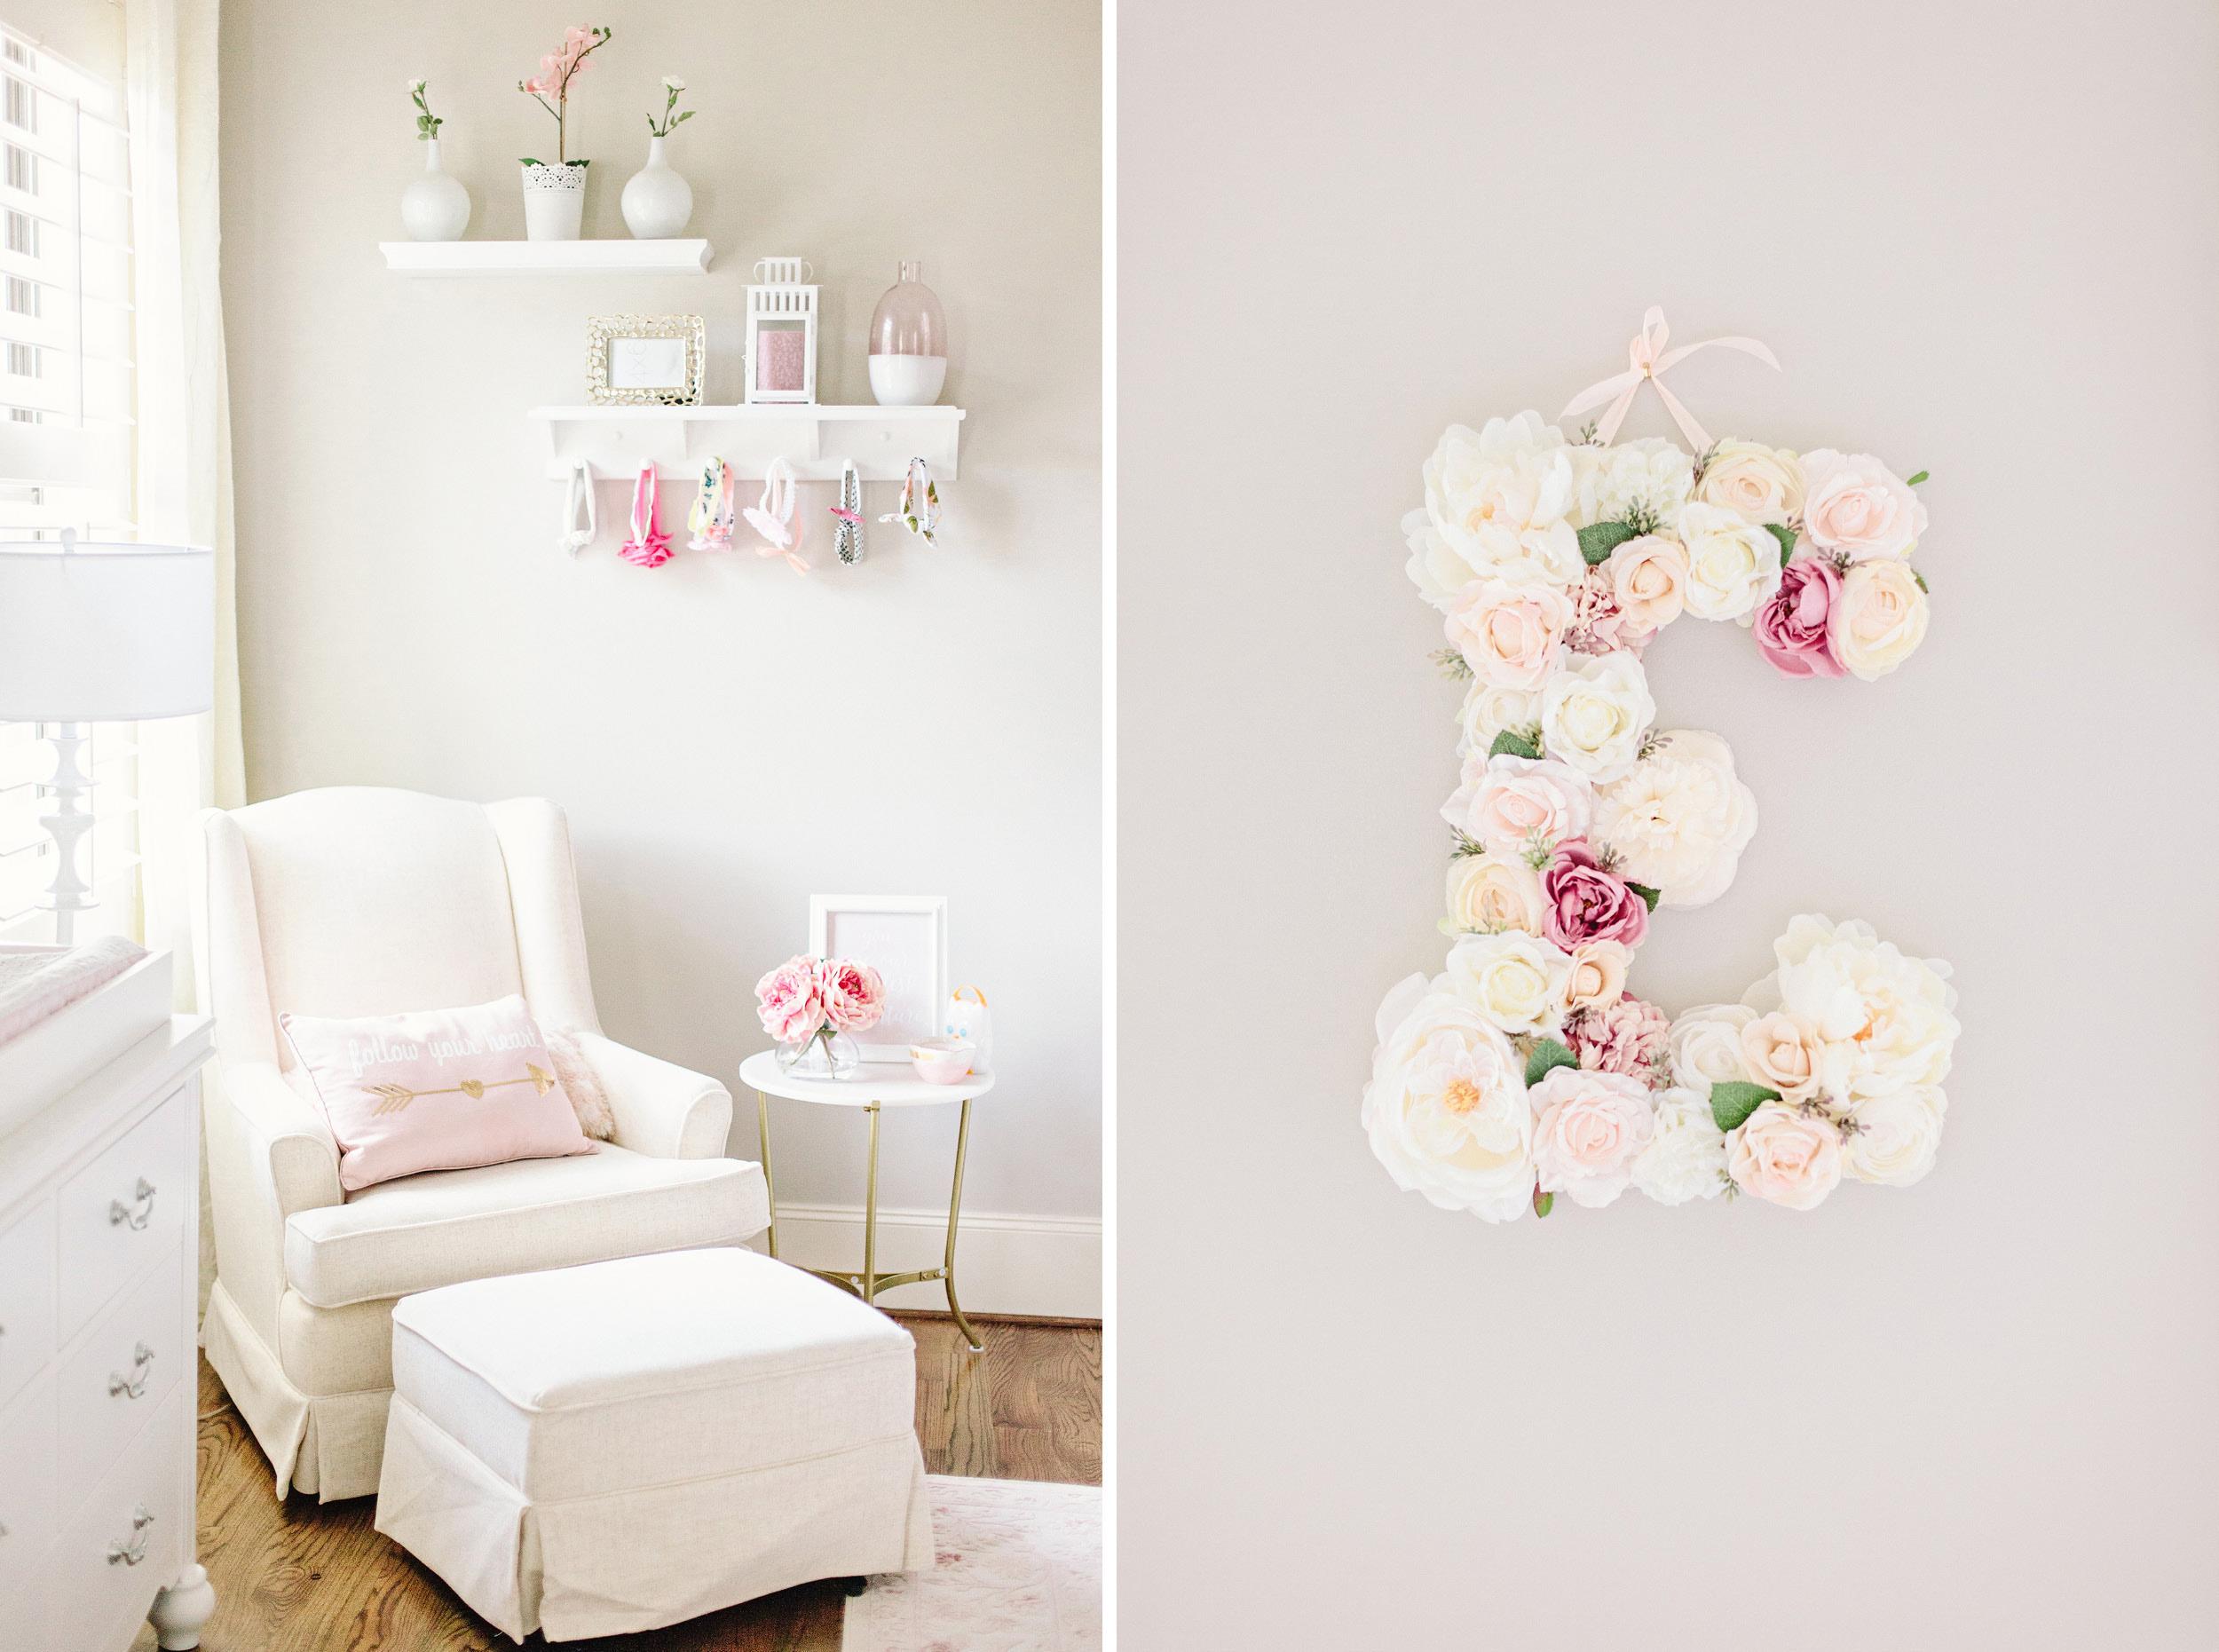 Houston Lifestyle Newborn Photography_Nursery Inspiration_Glider Chair_Flower Letter